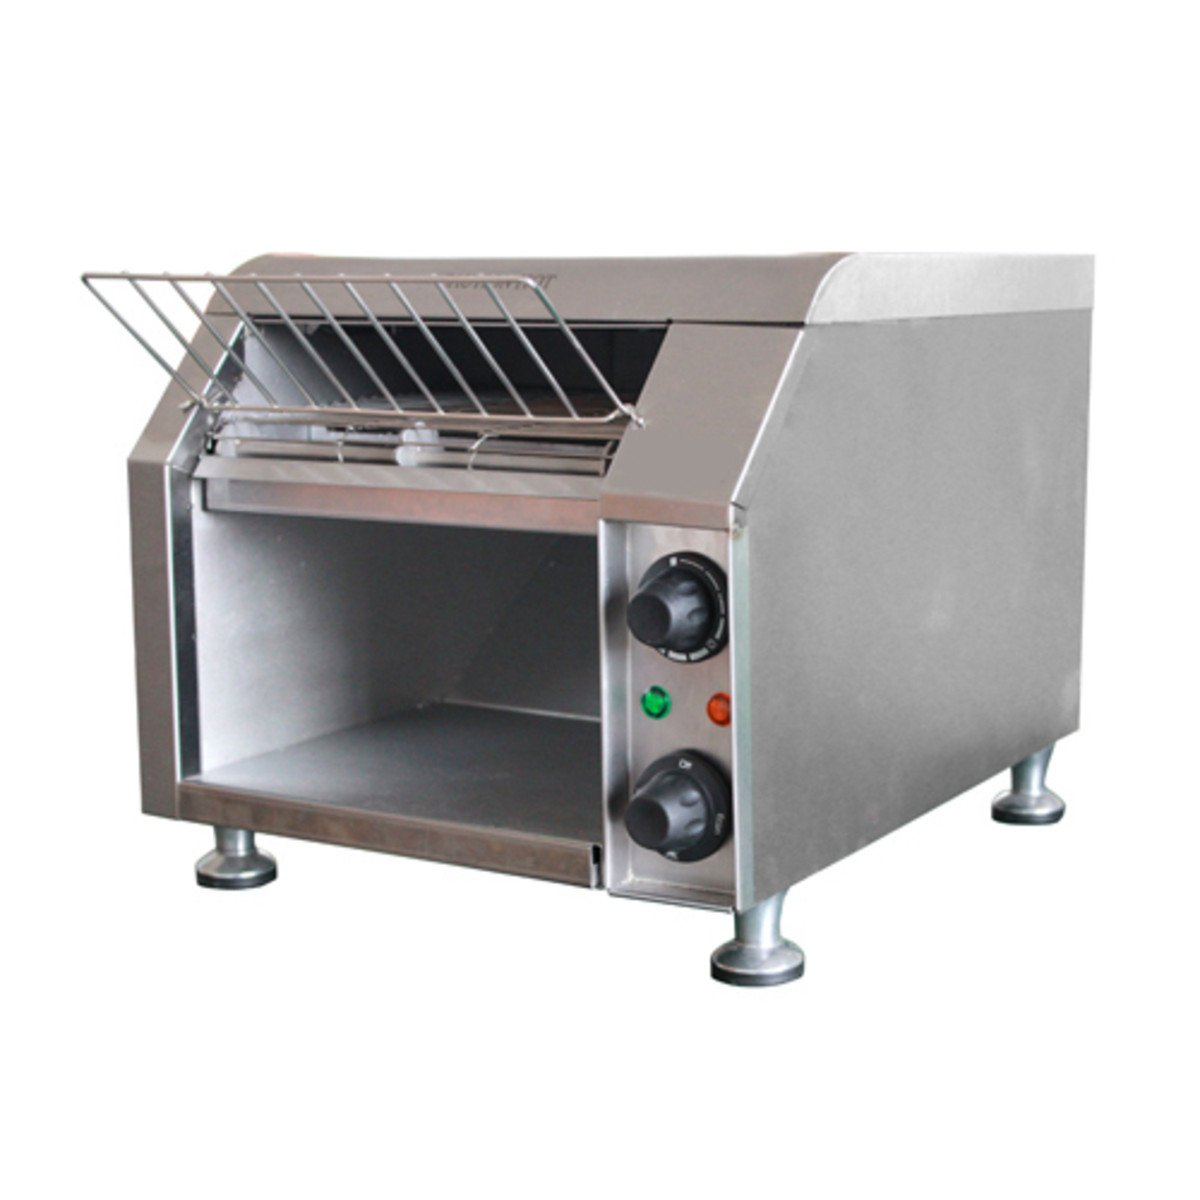 Adcraft CVYT-120 Countertop Conveyor Toaster, Stainless Steel, 120v, NSF